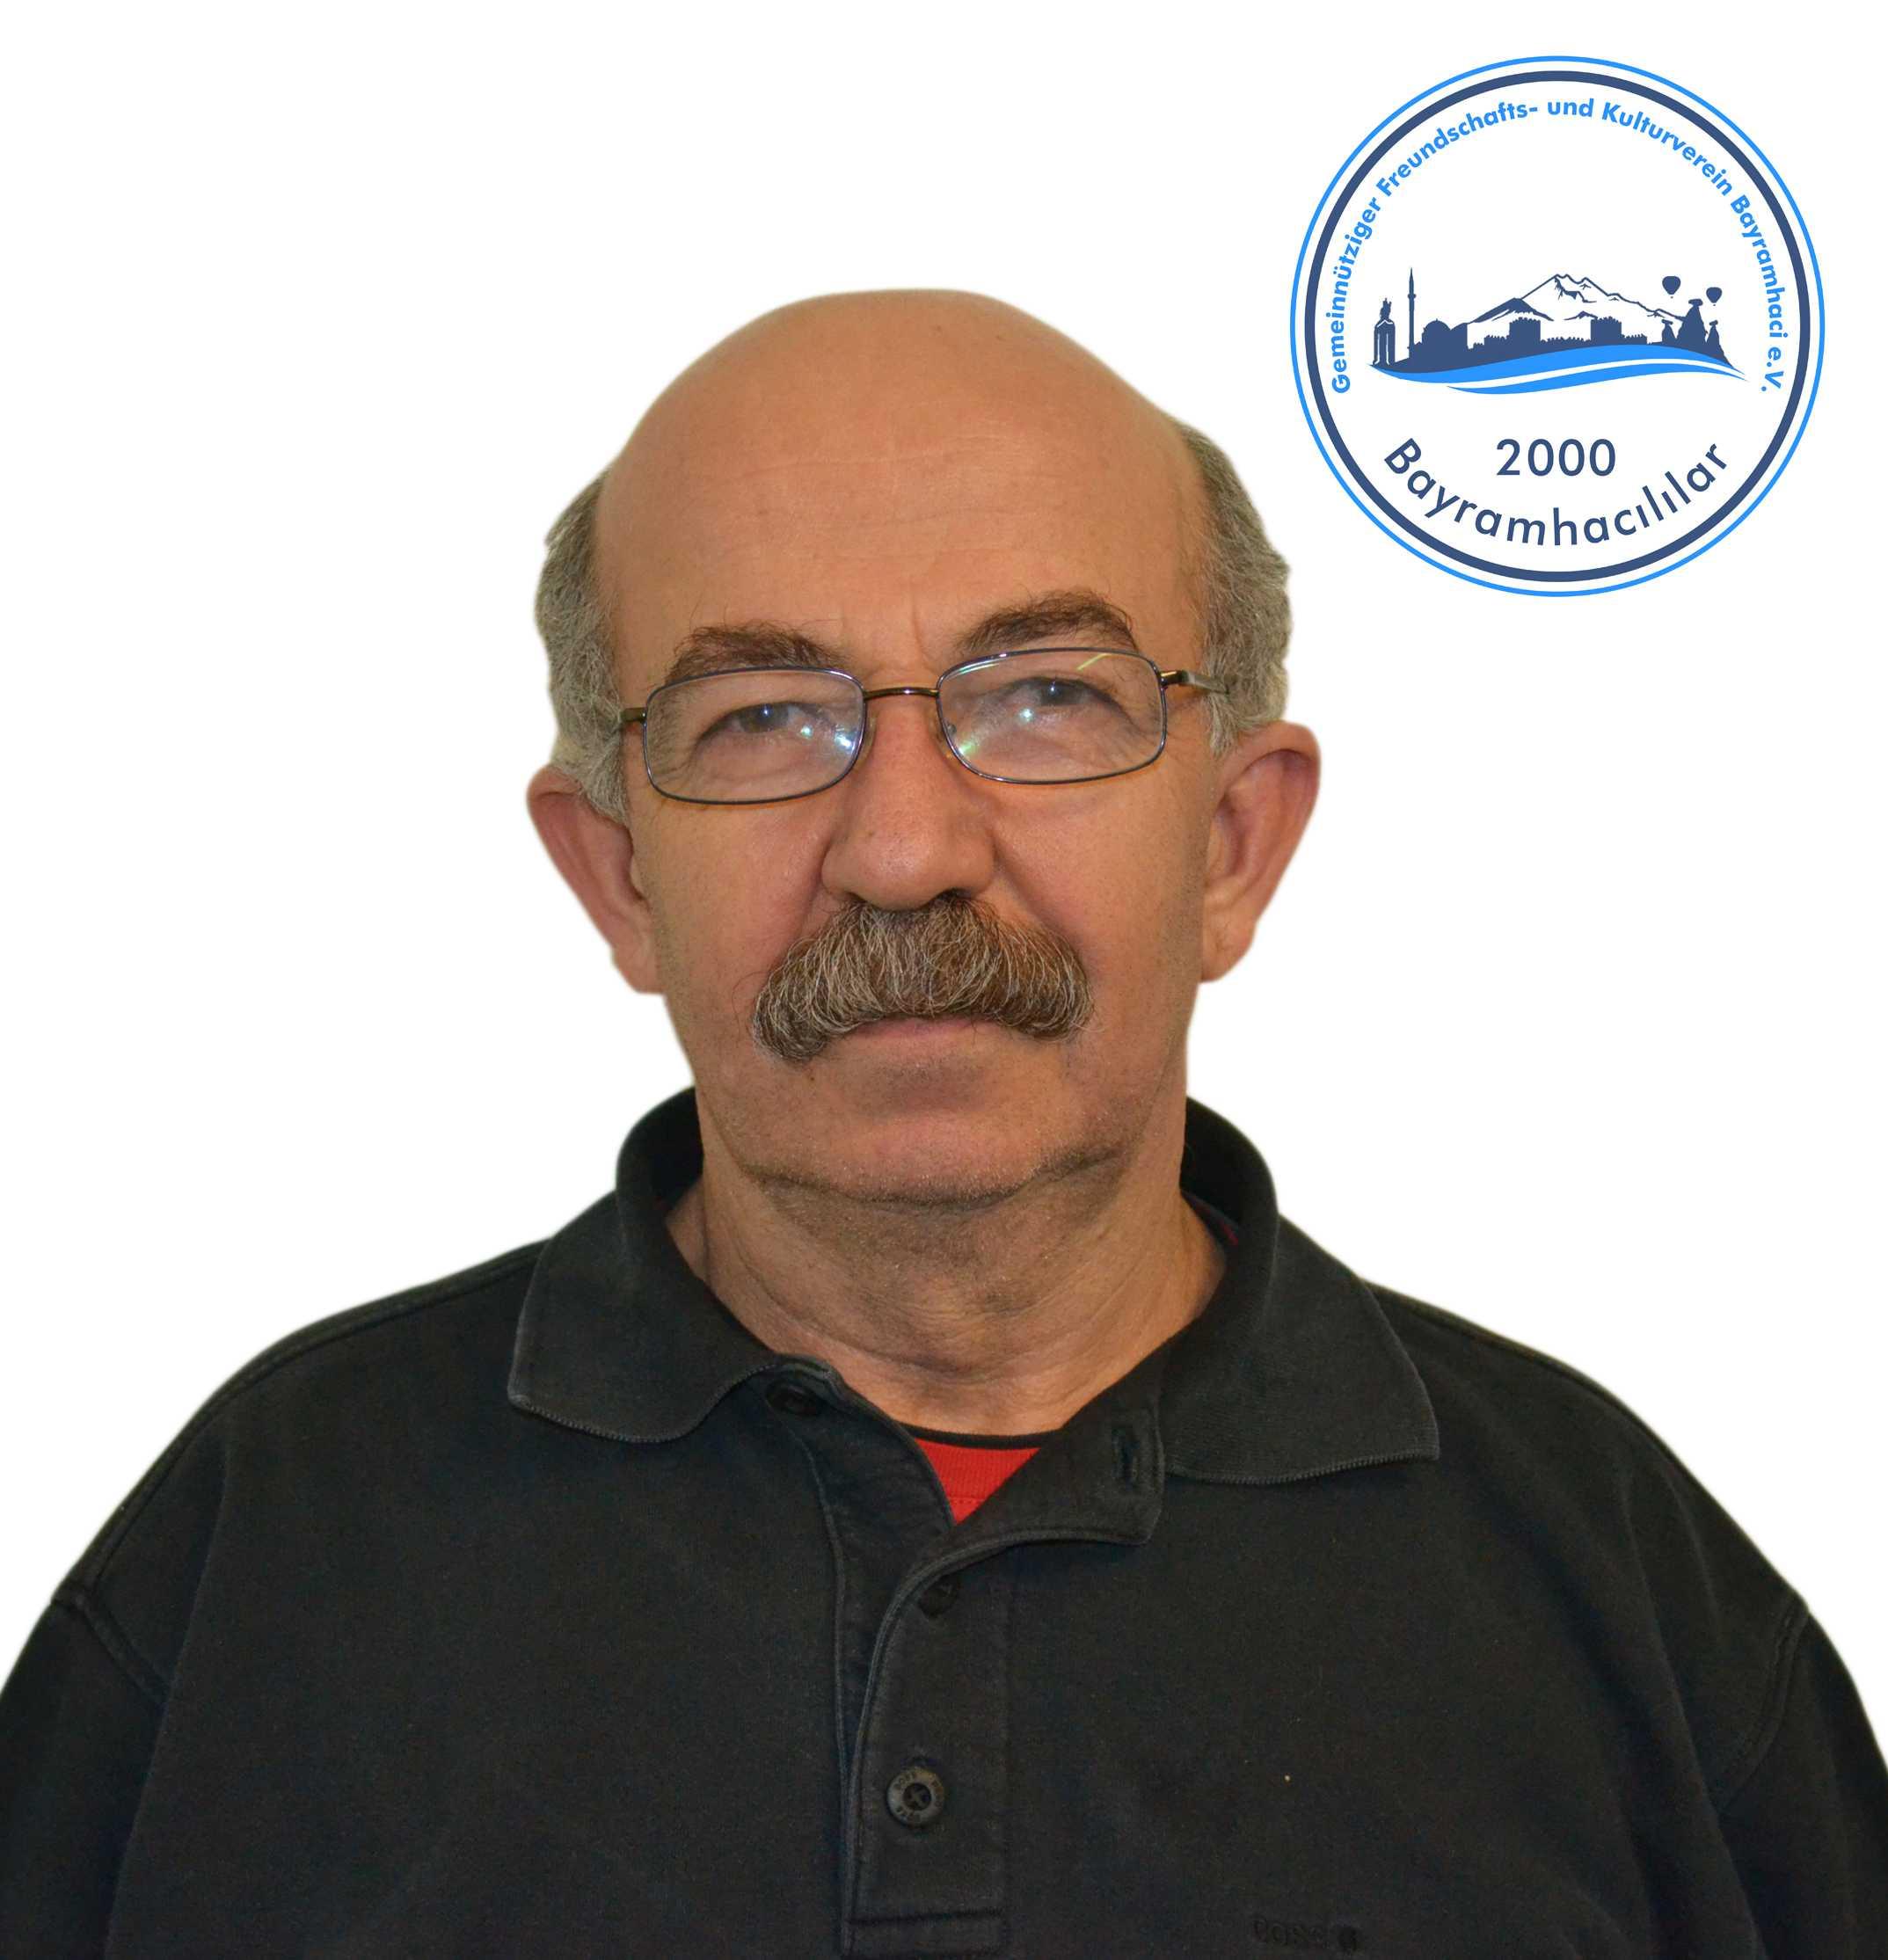 Ali Demirkoparan